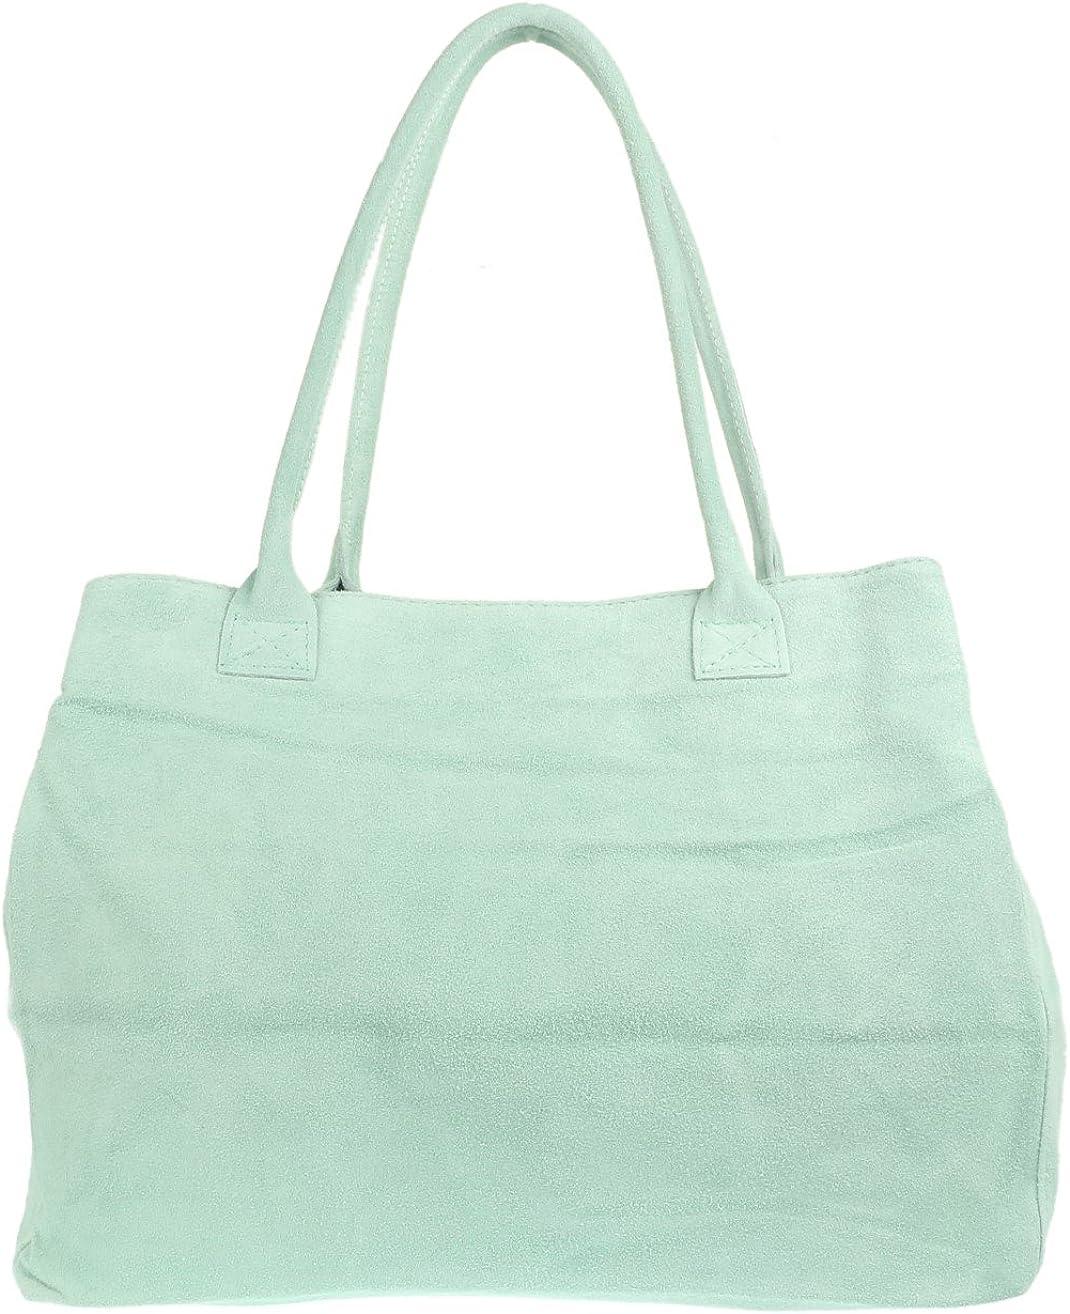 Girly Handbags Expandable...